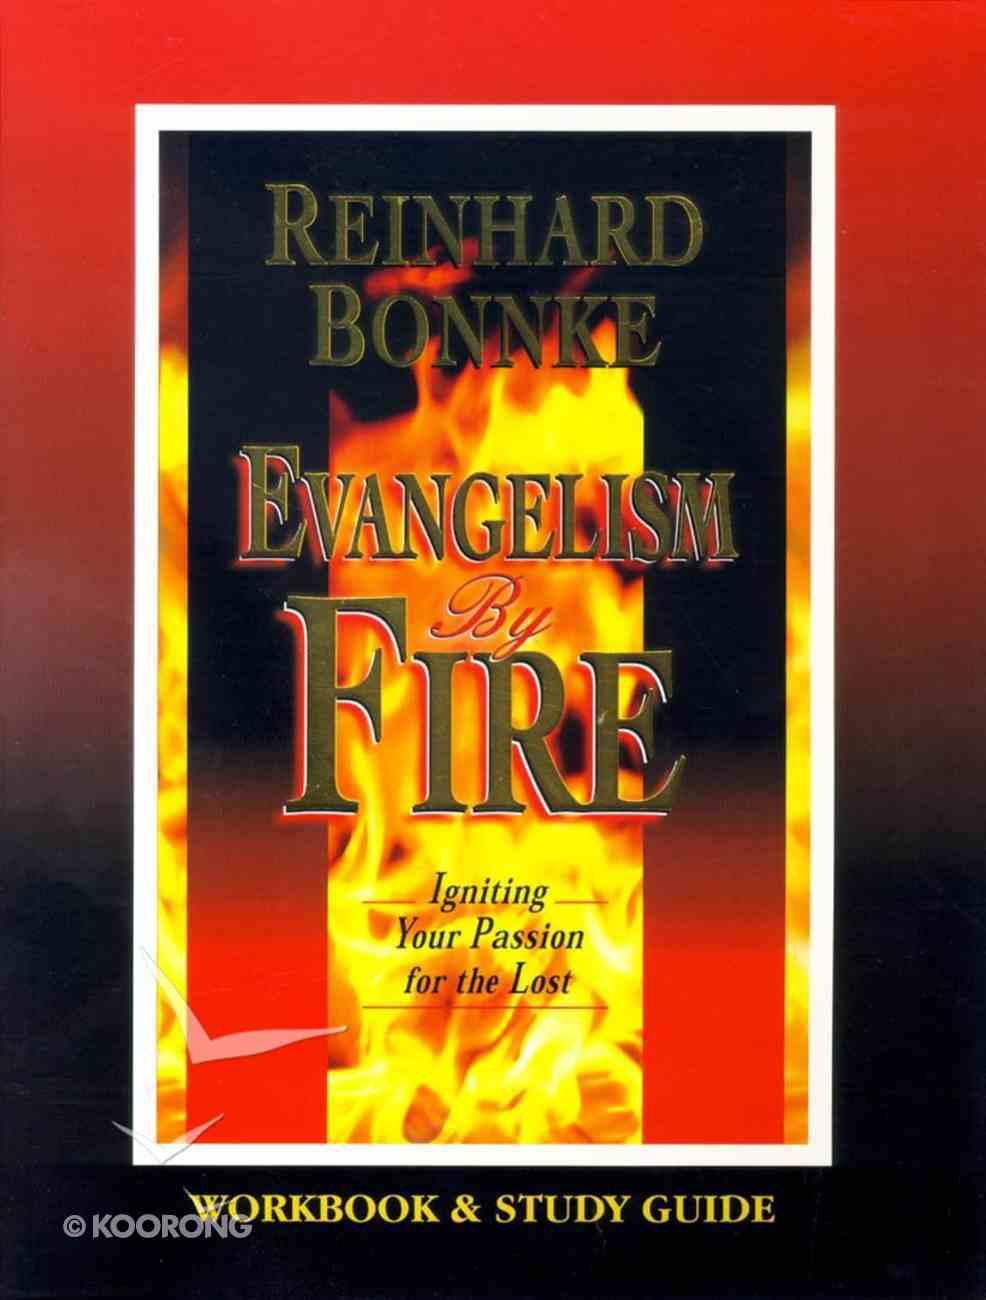 Evangelism By Fire (Workbook & Study Guide) Paperback